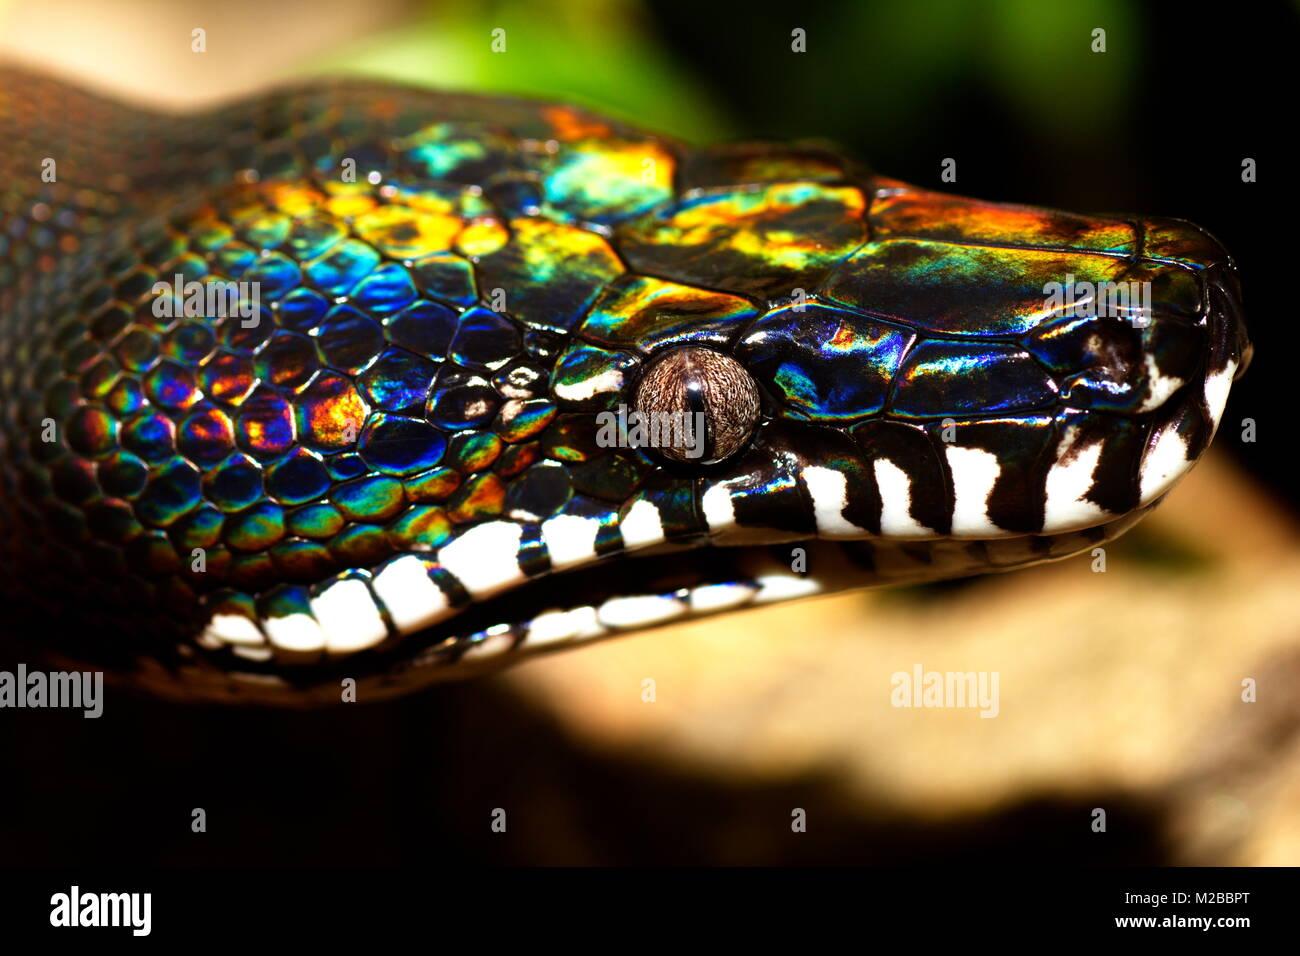 Python Snake Stock Photos & Python Snake Stock Images - Alamy